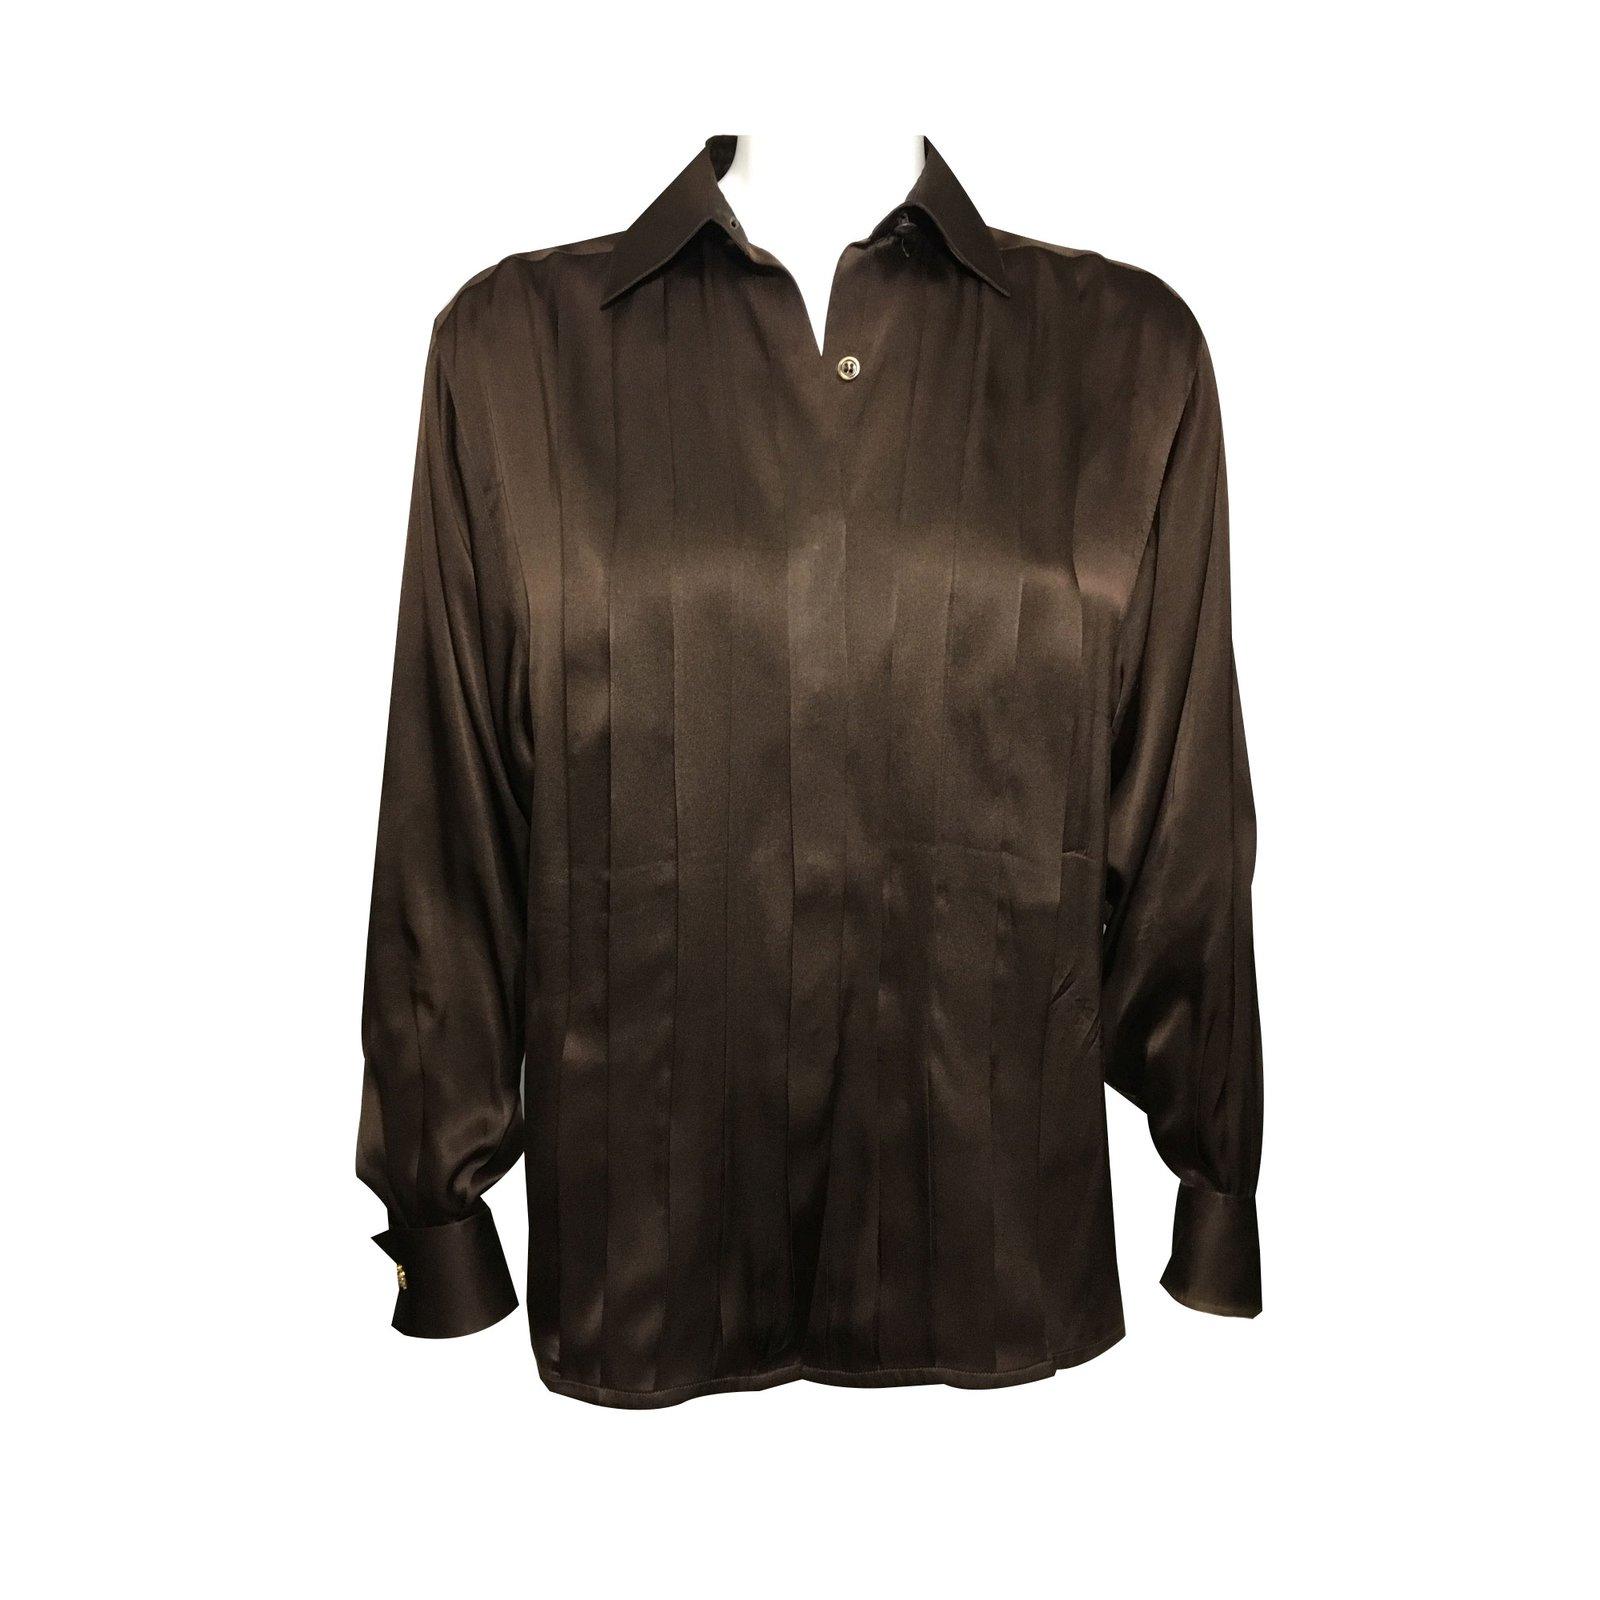 tops chanel chemise bouton manchette soie chocolat ref. Black Bedroom Furniture Sets. Home Design Ideas